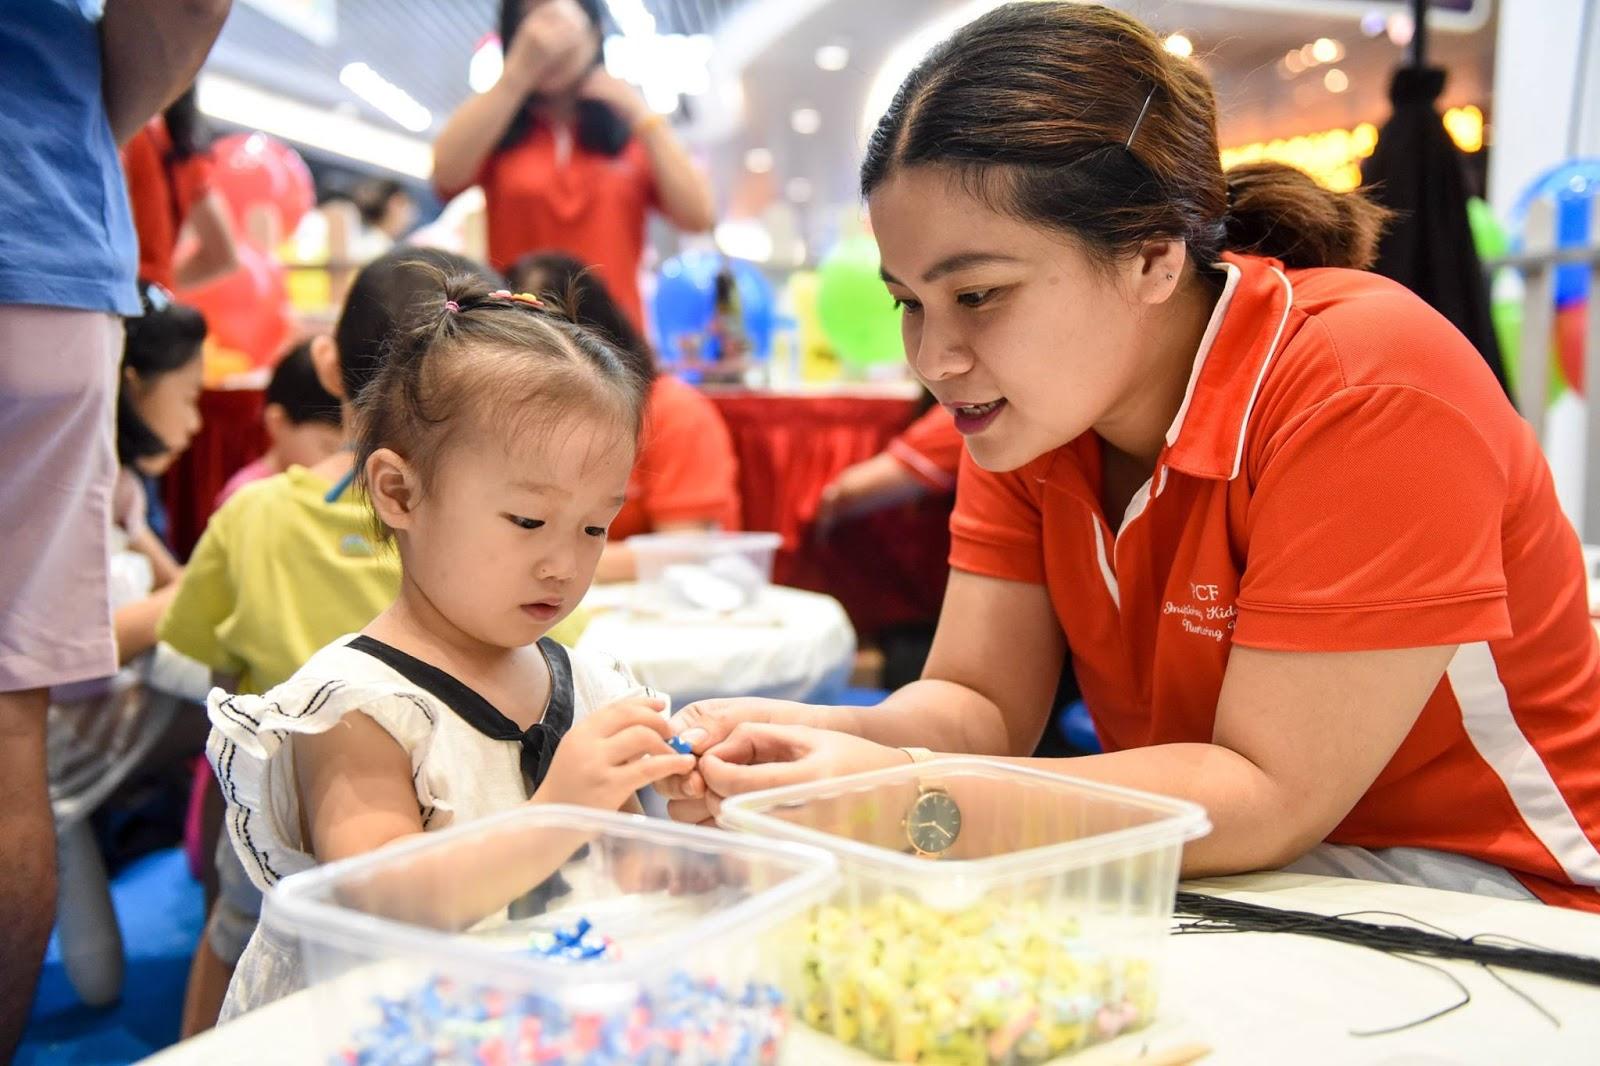 pcf caretaker with child